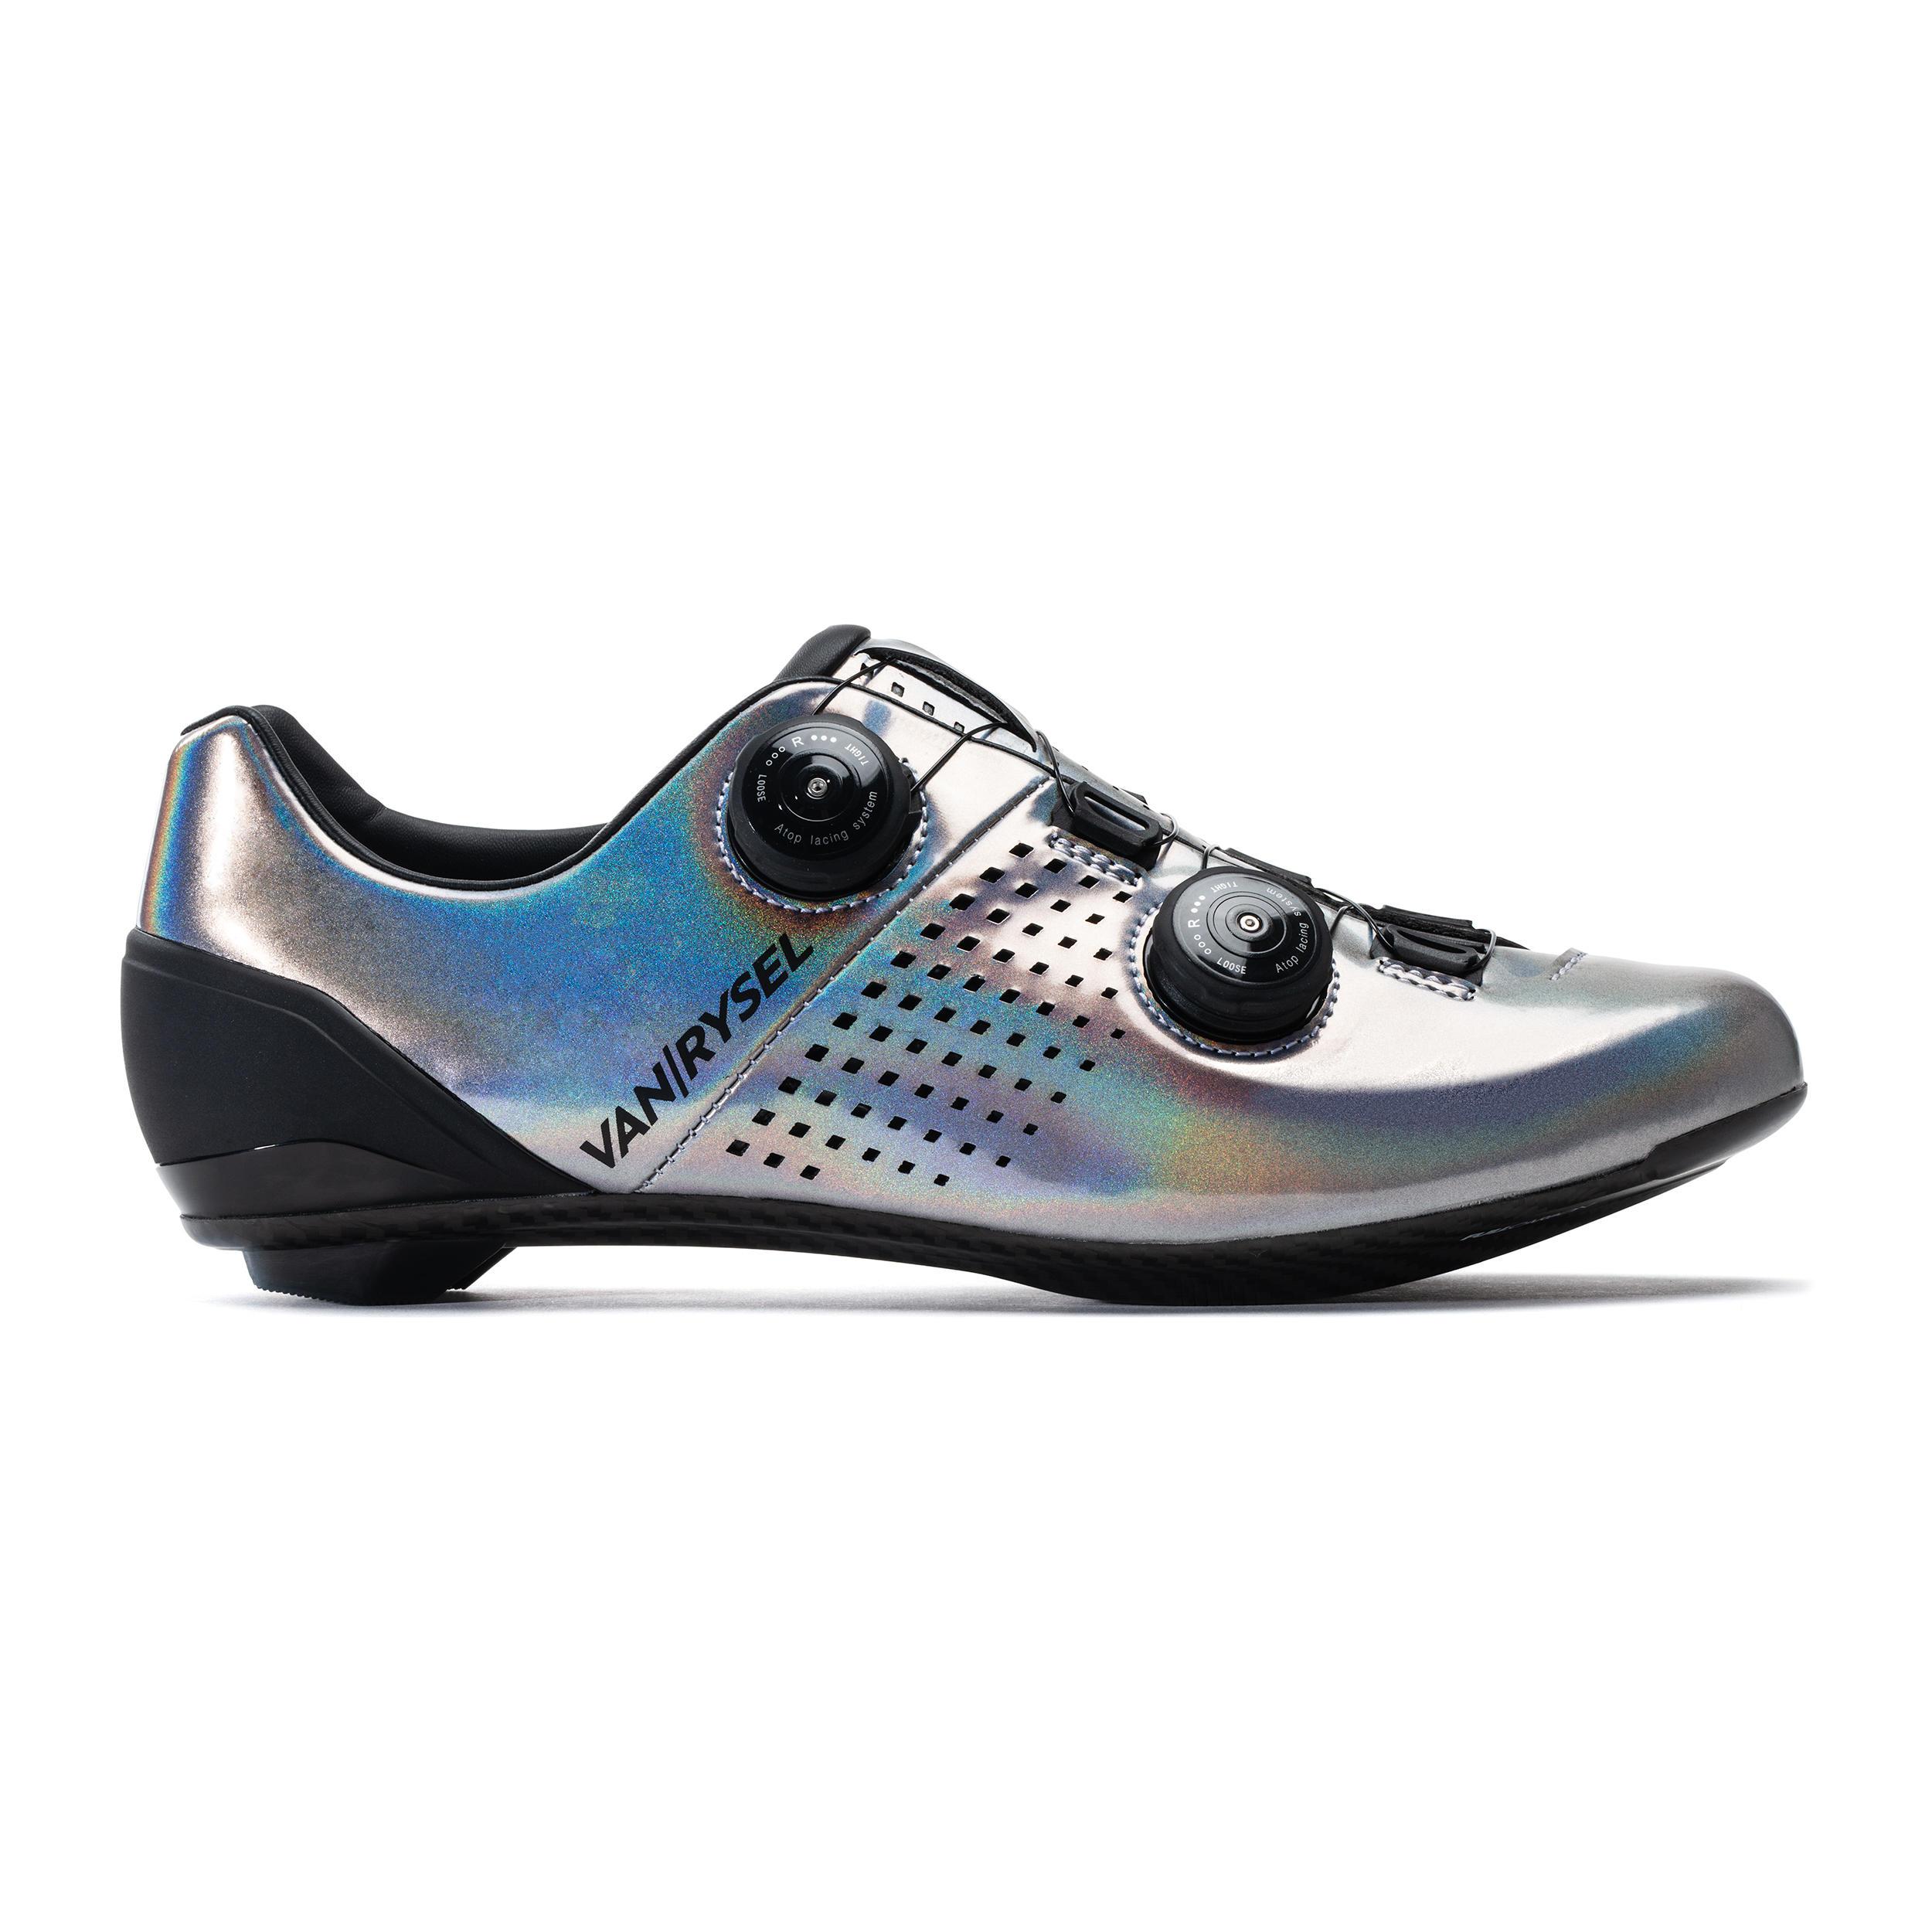 Fahrradschuhe Rennrad RR 900 silber   Schuhe > Sportschuhe > Fahrradschuhe   Grau   Van rysel